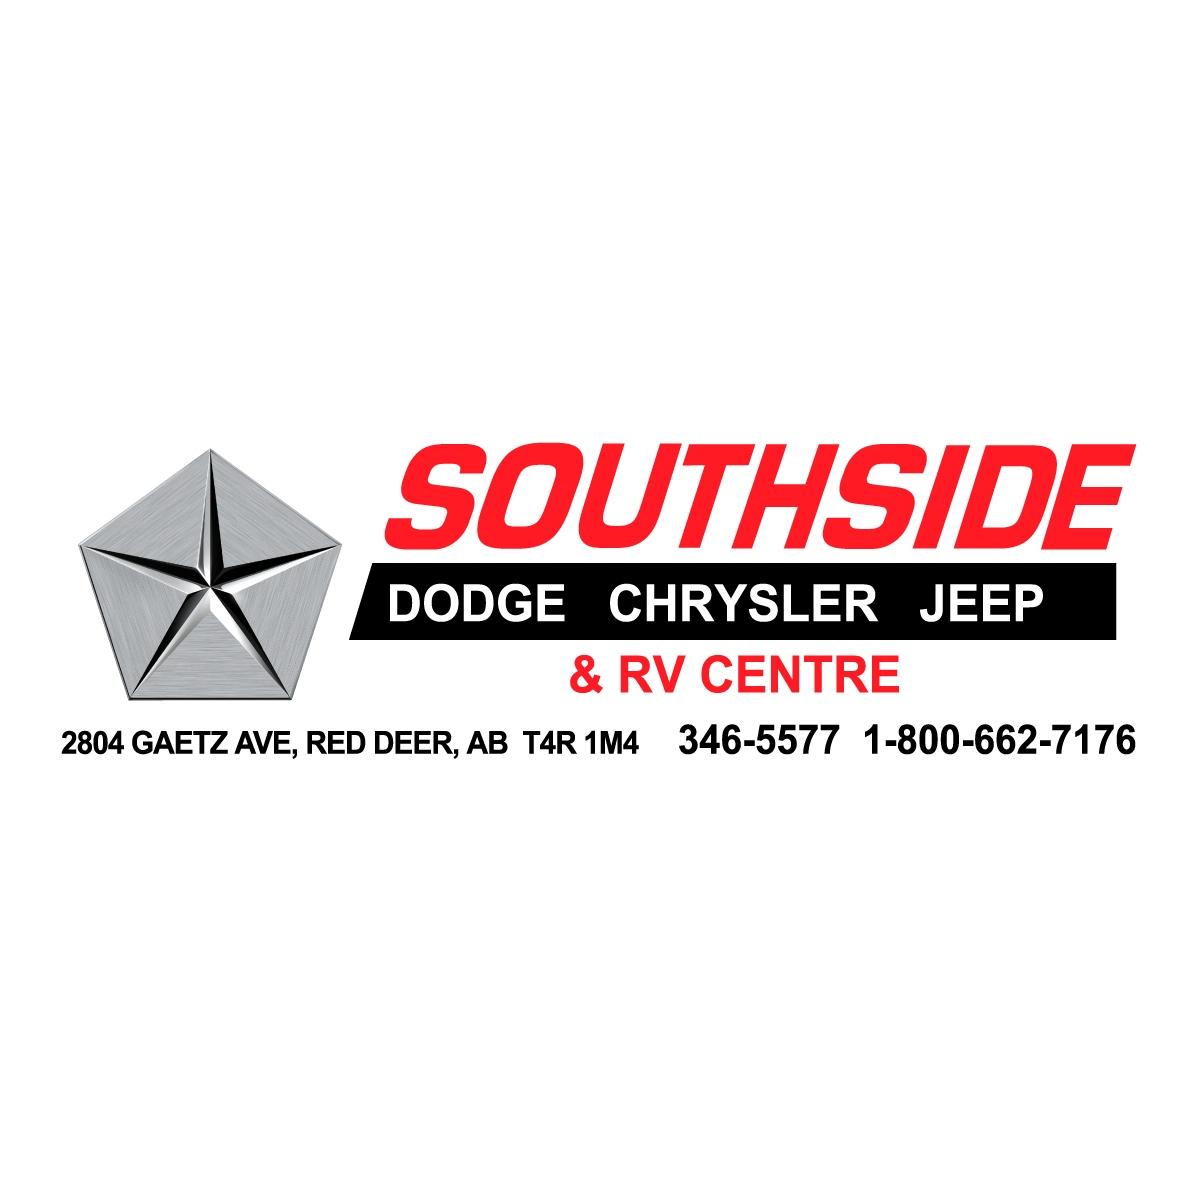 Southside Dodge Chrysler Jeep & RV Centre